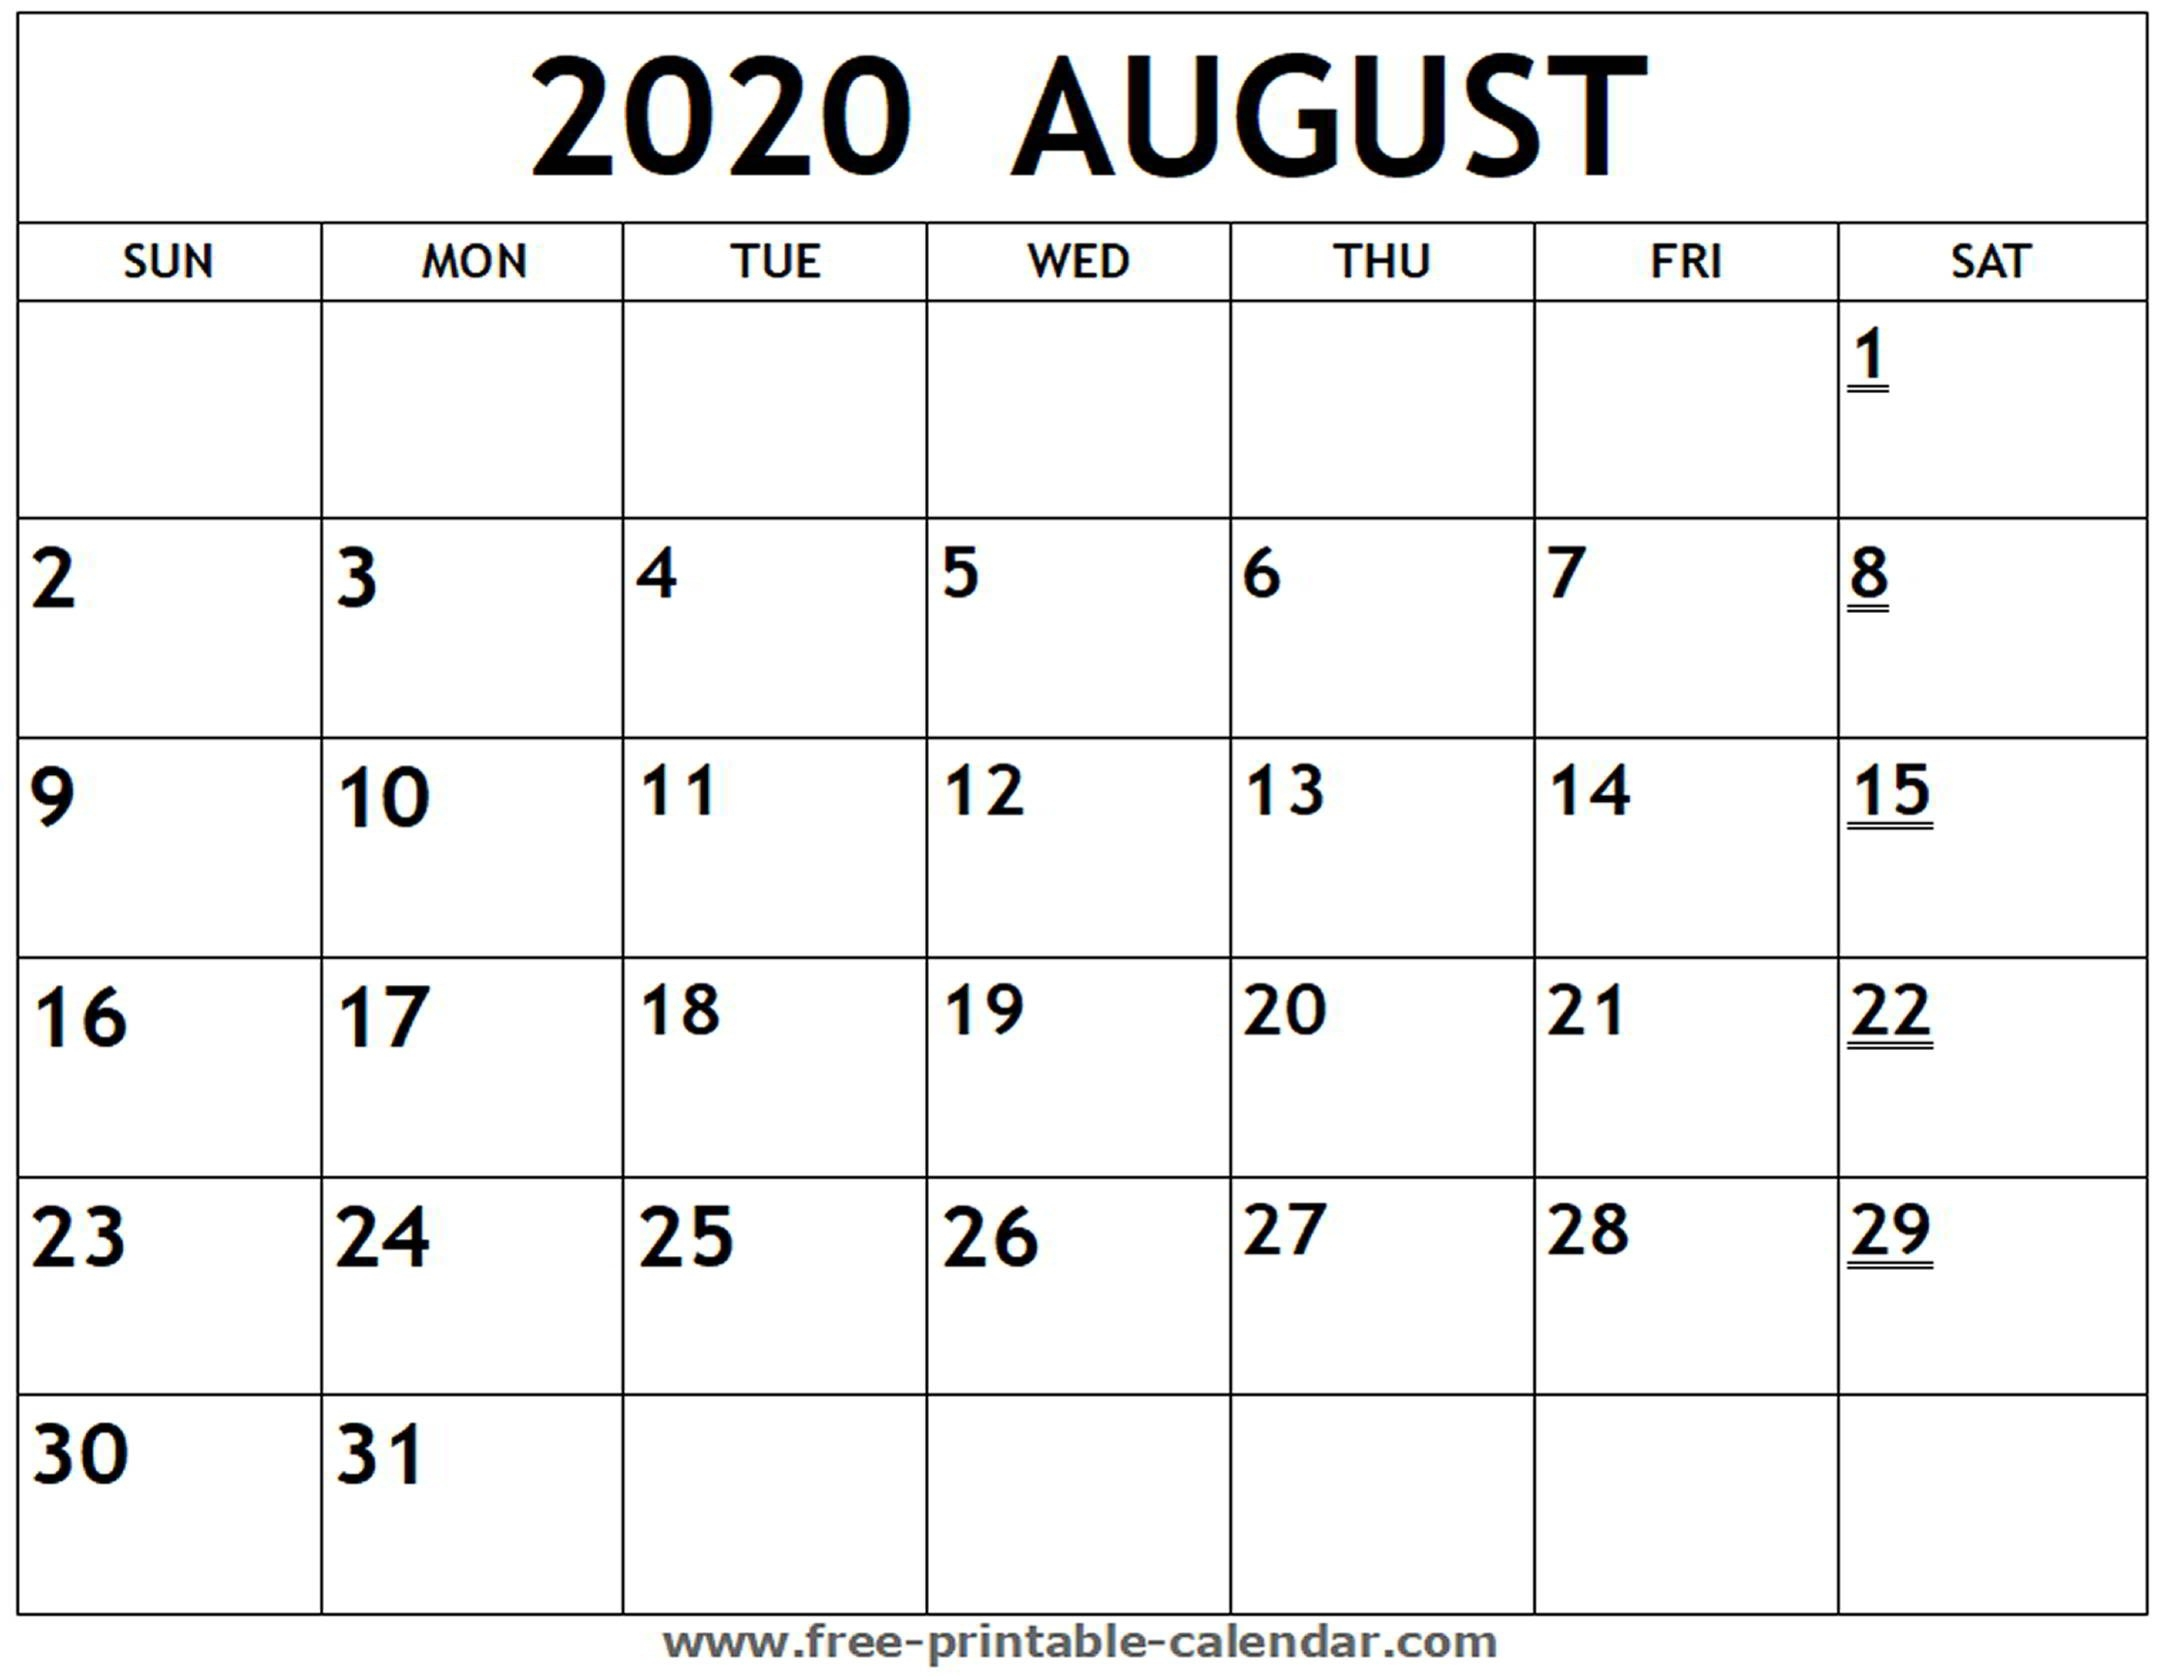 Aug Calendar 2020-Free Monthly Holiday Themed Calendar Printable 2020-2020